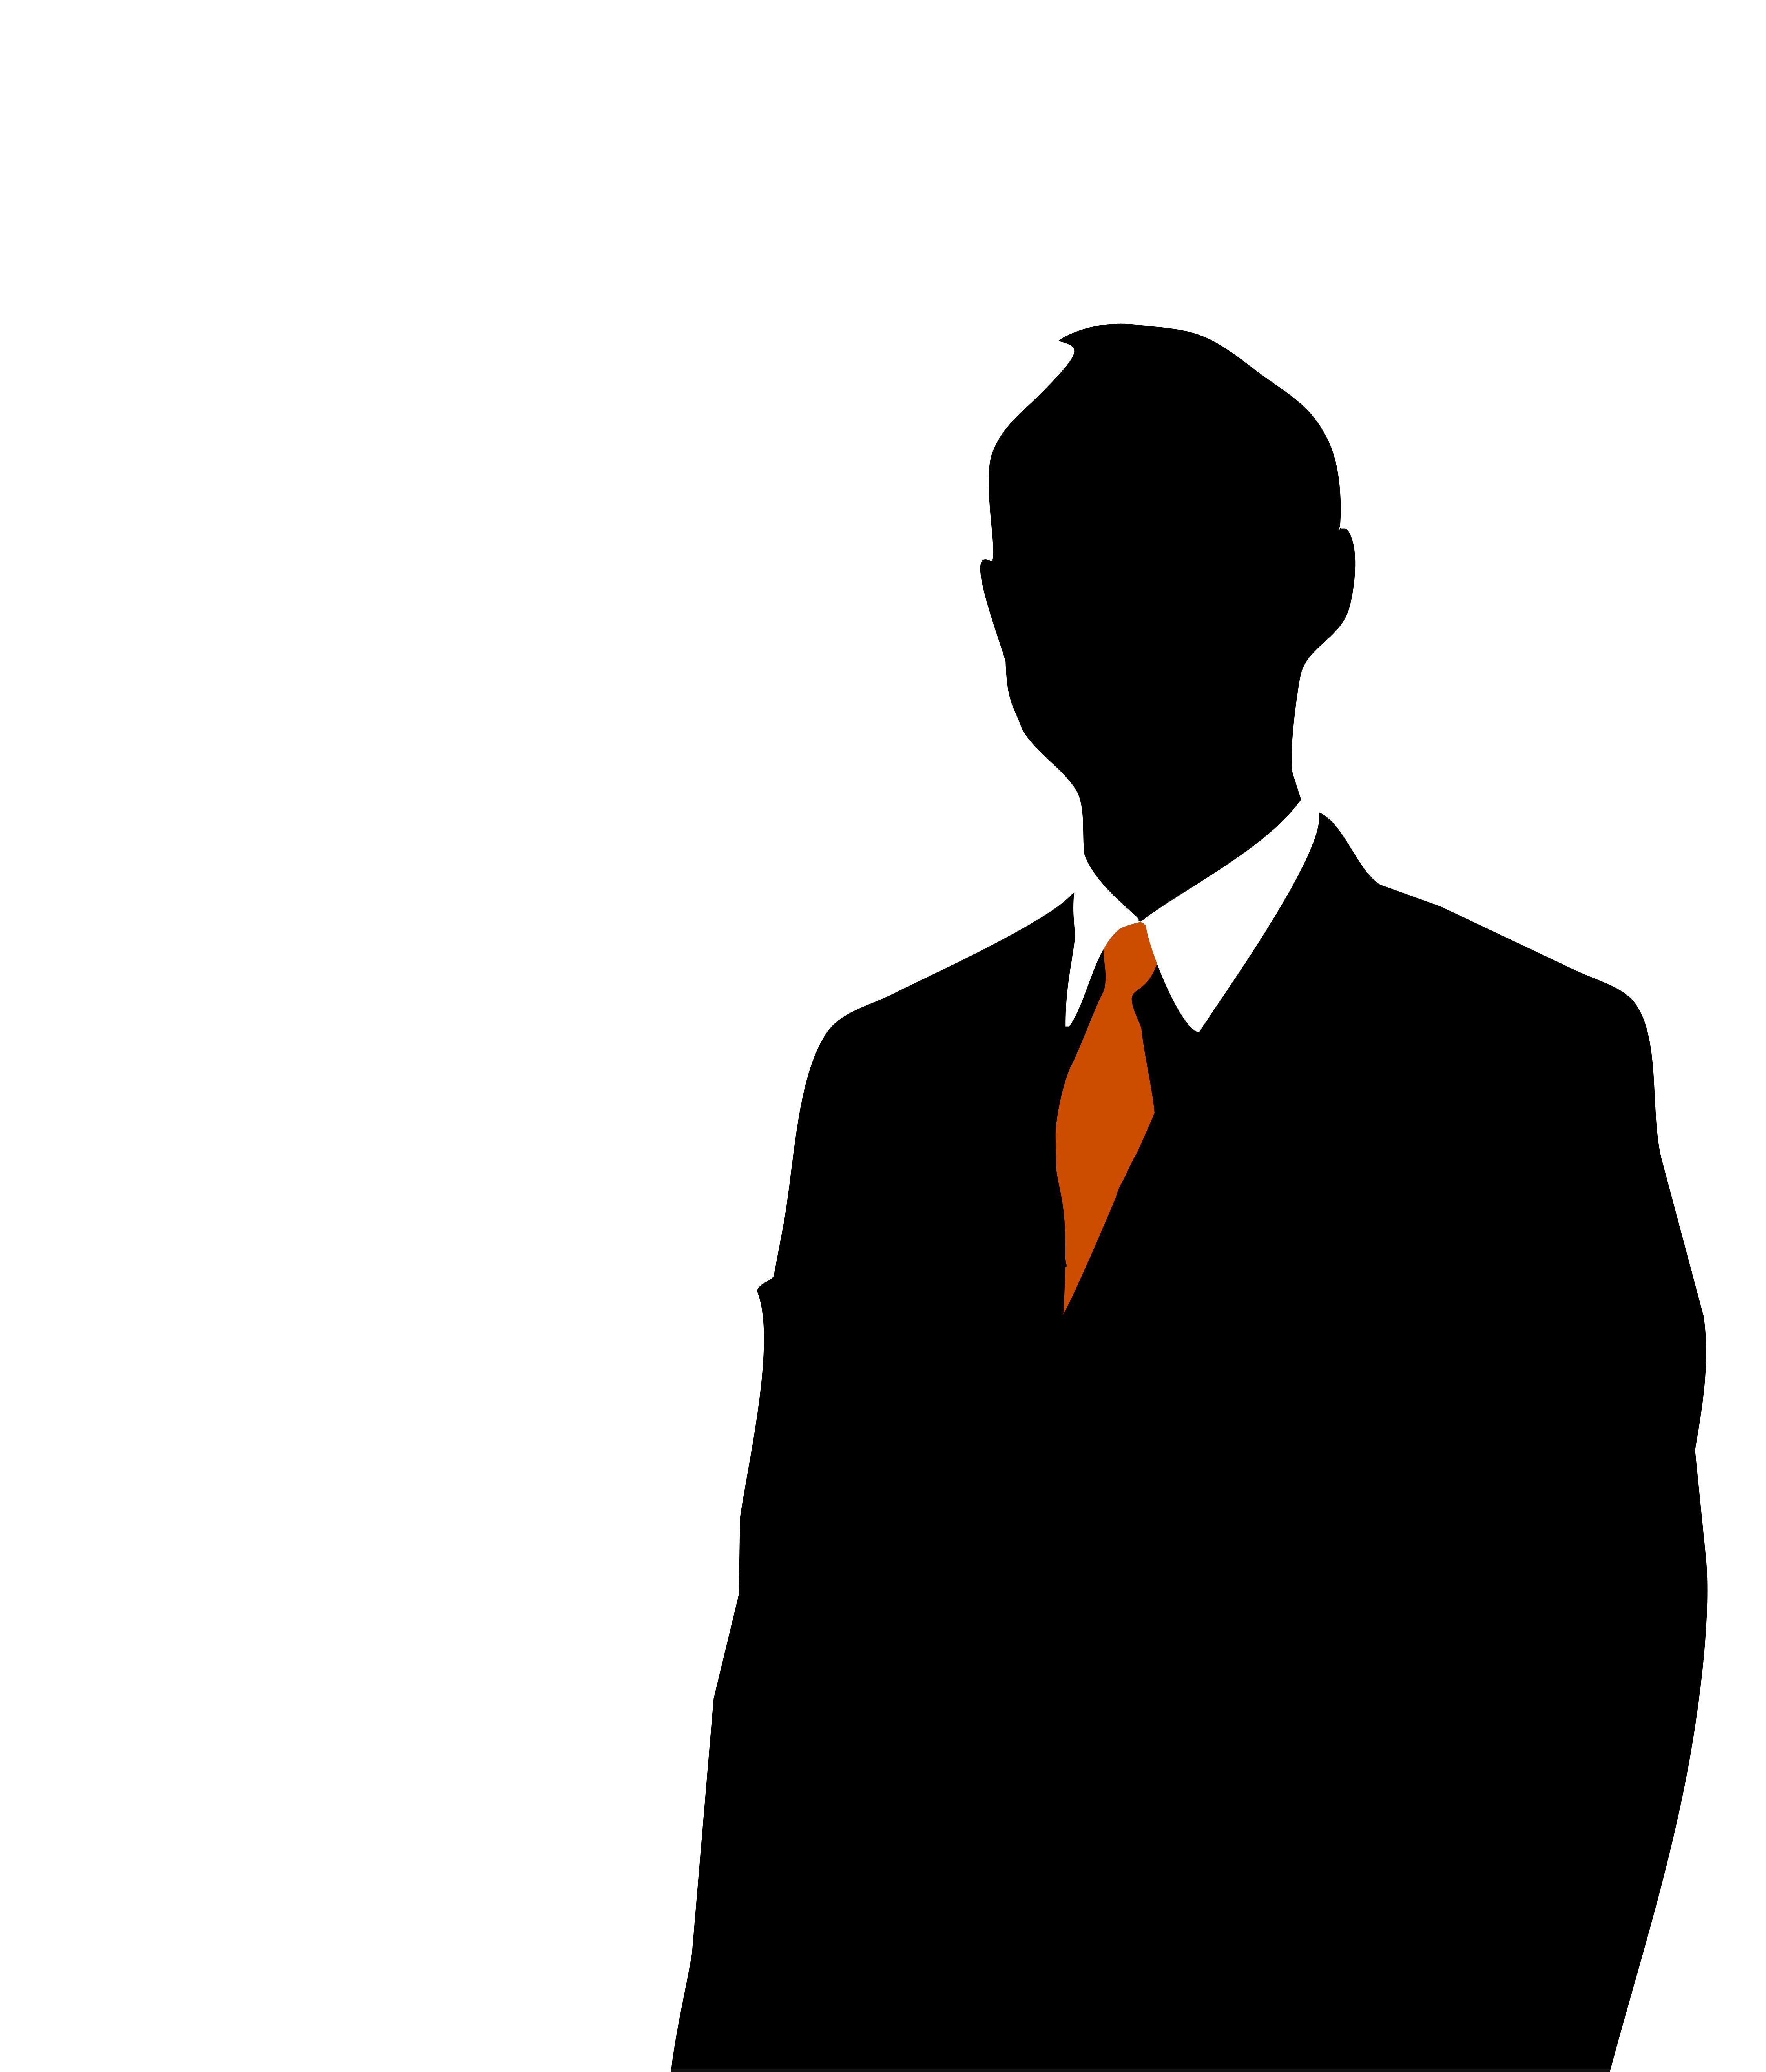 Man silhouette clip art. Business clipart business person